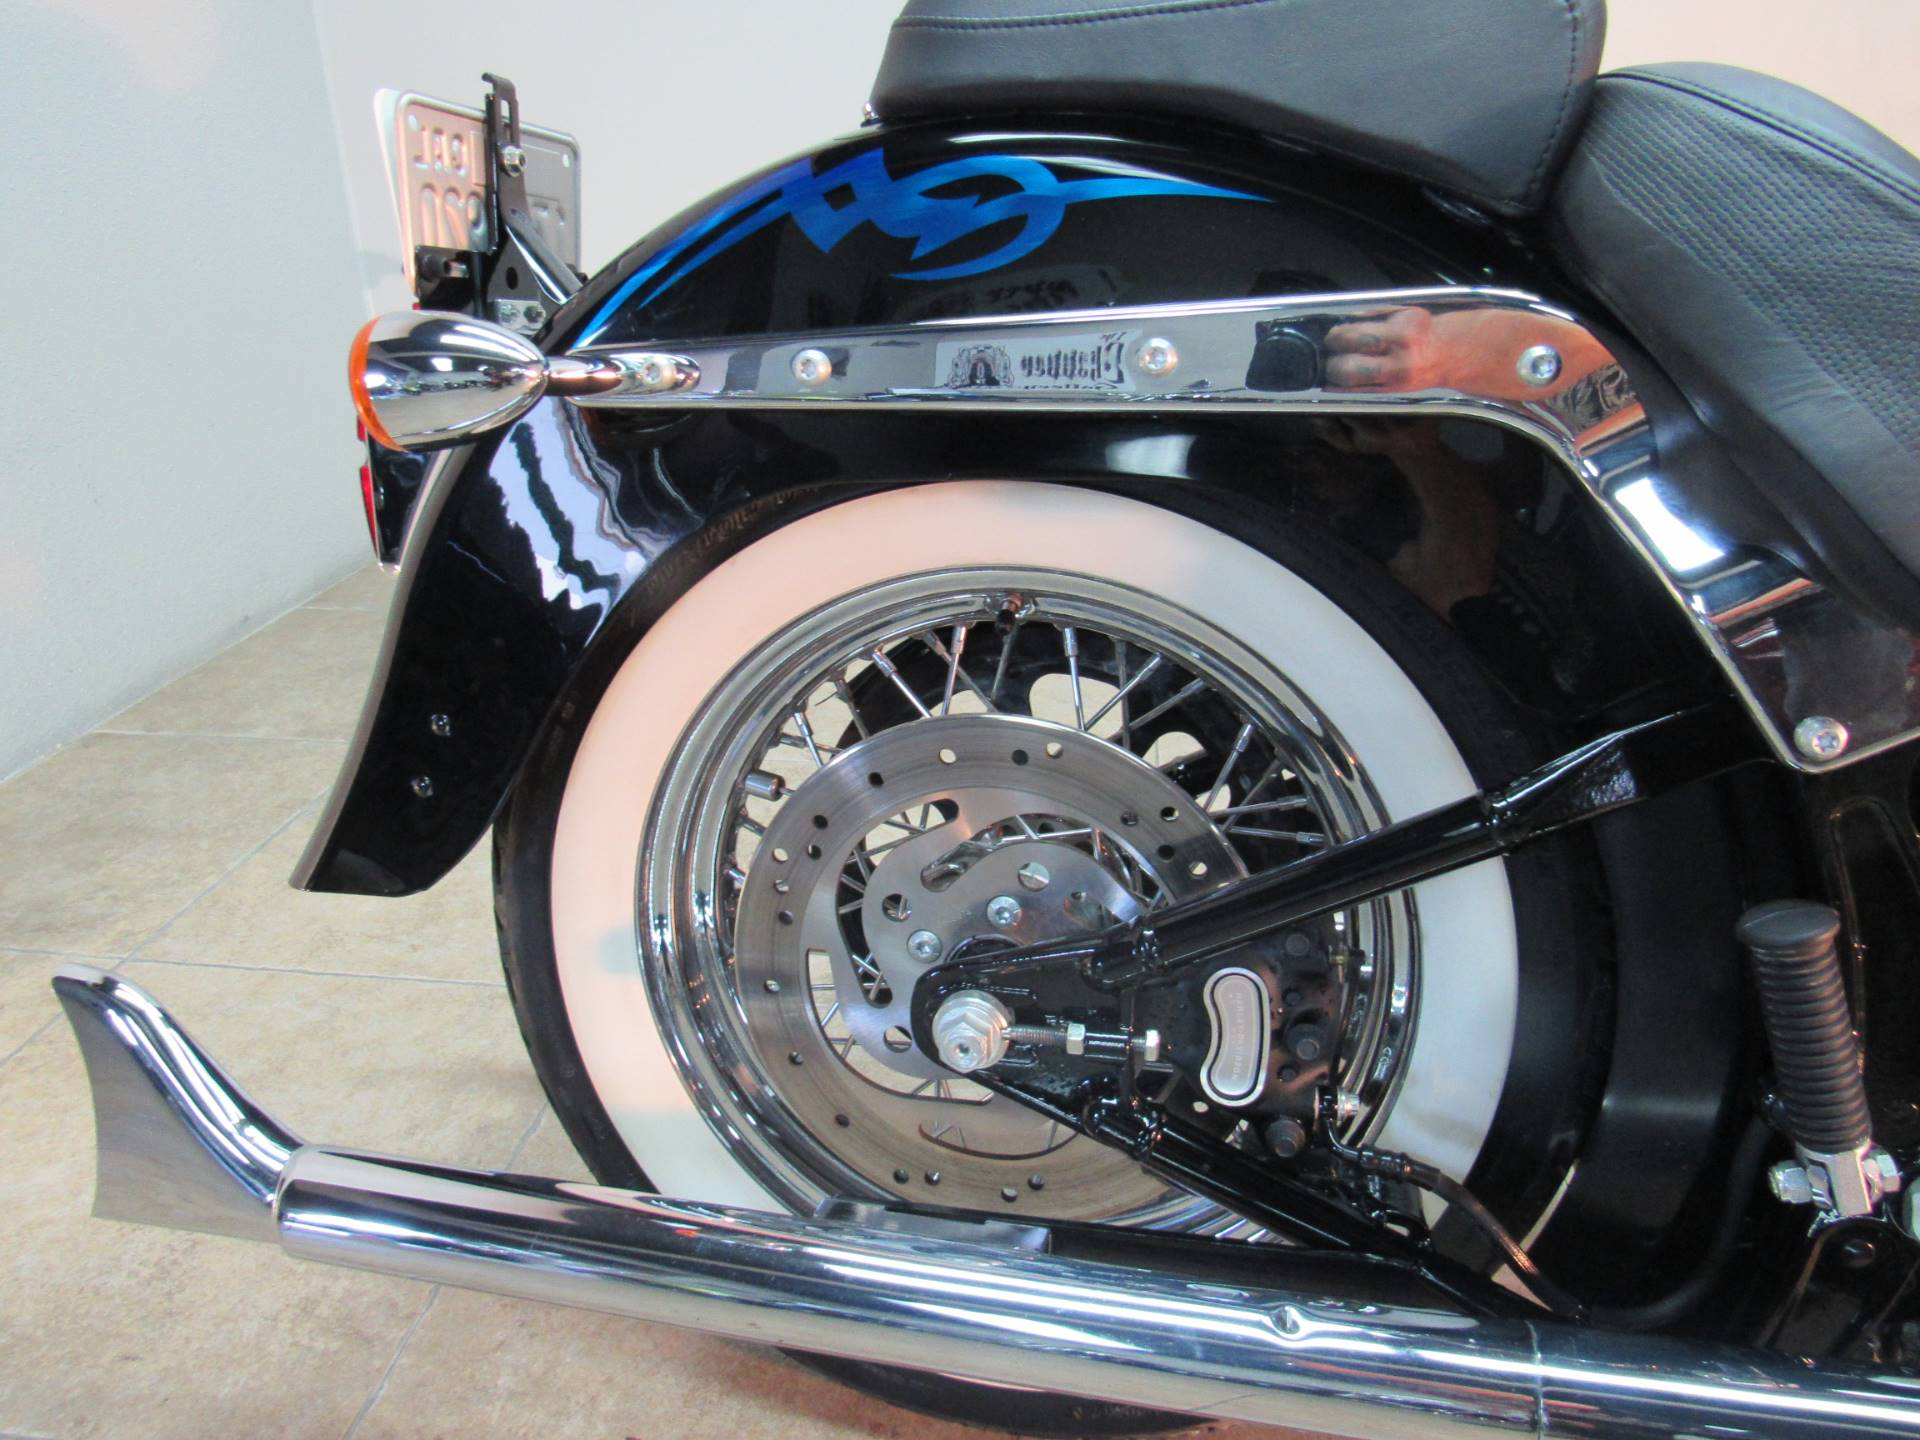 2005 Harley-Davidson FLSTSC/FLSTSCI Softail Springer Classic 10